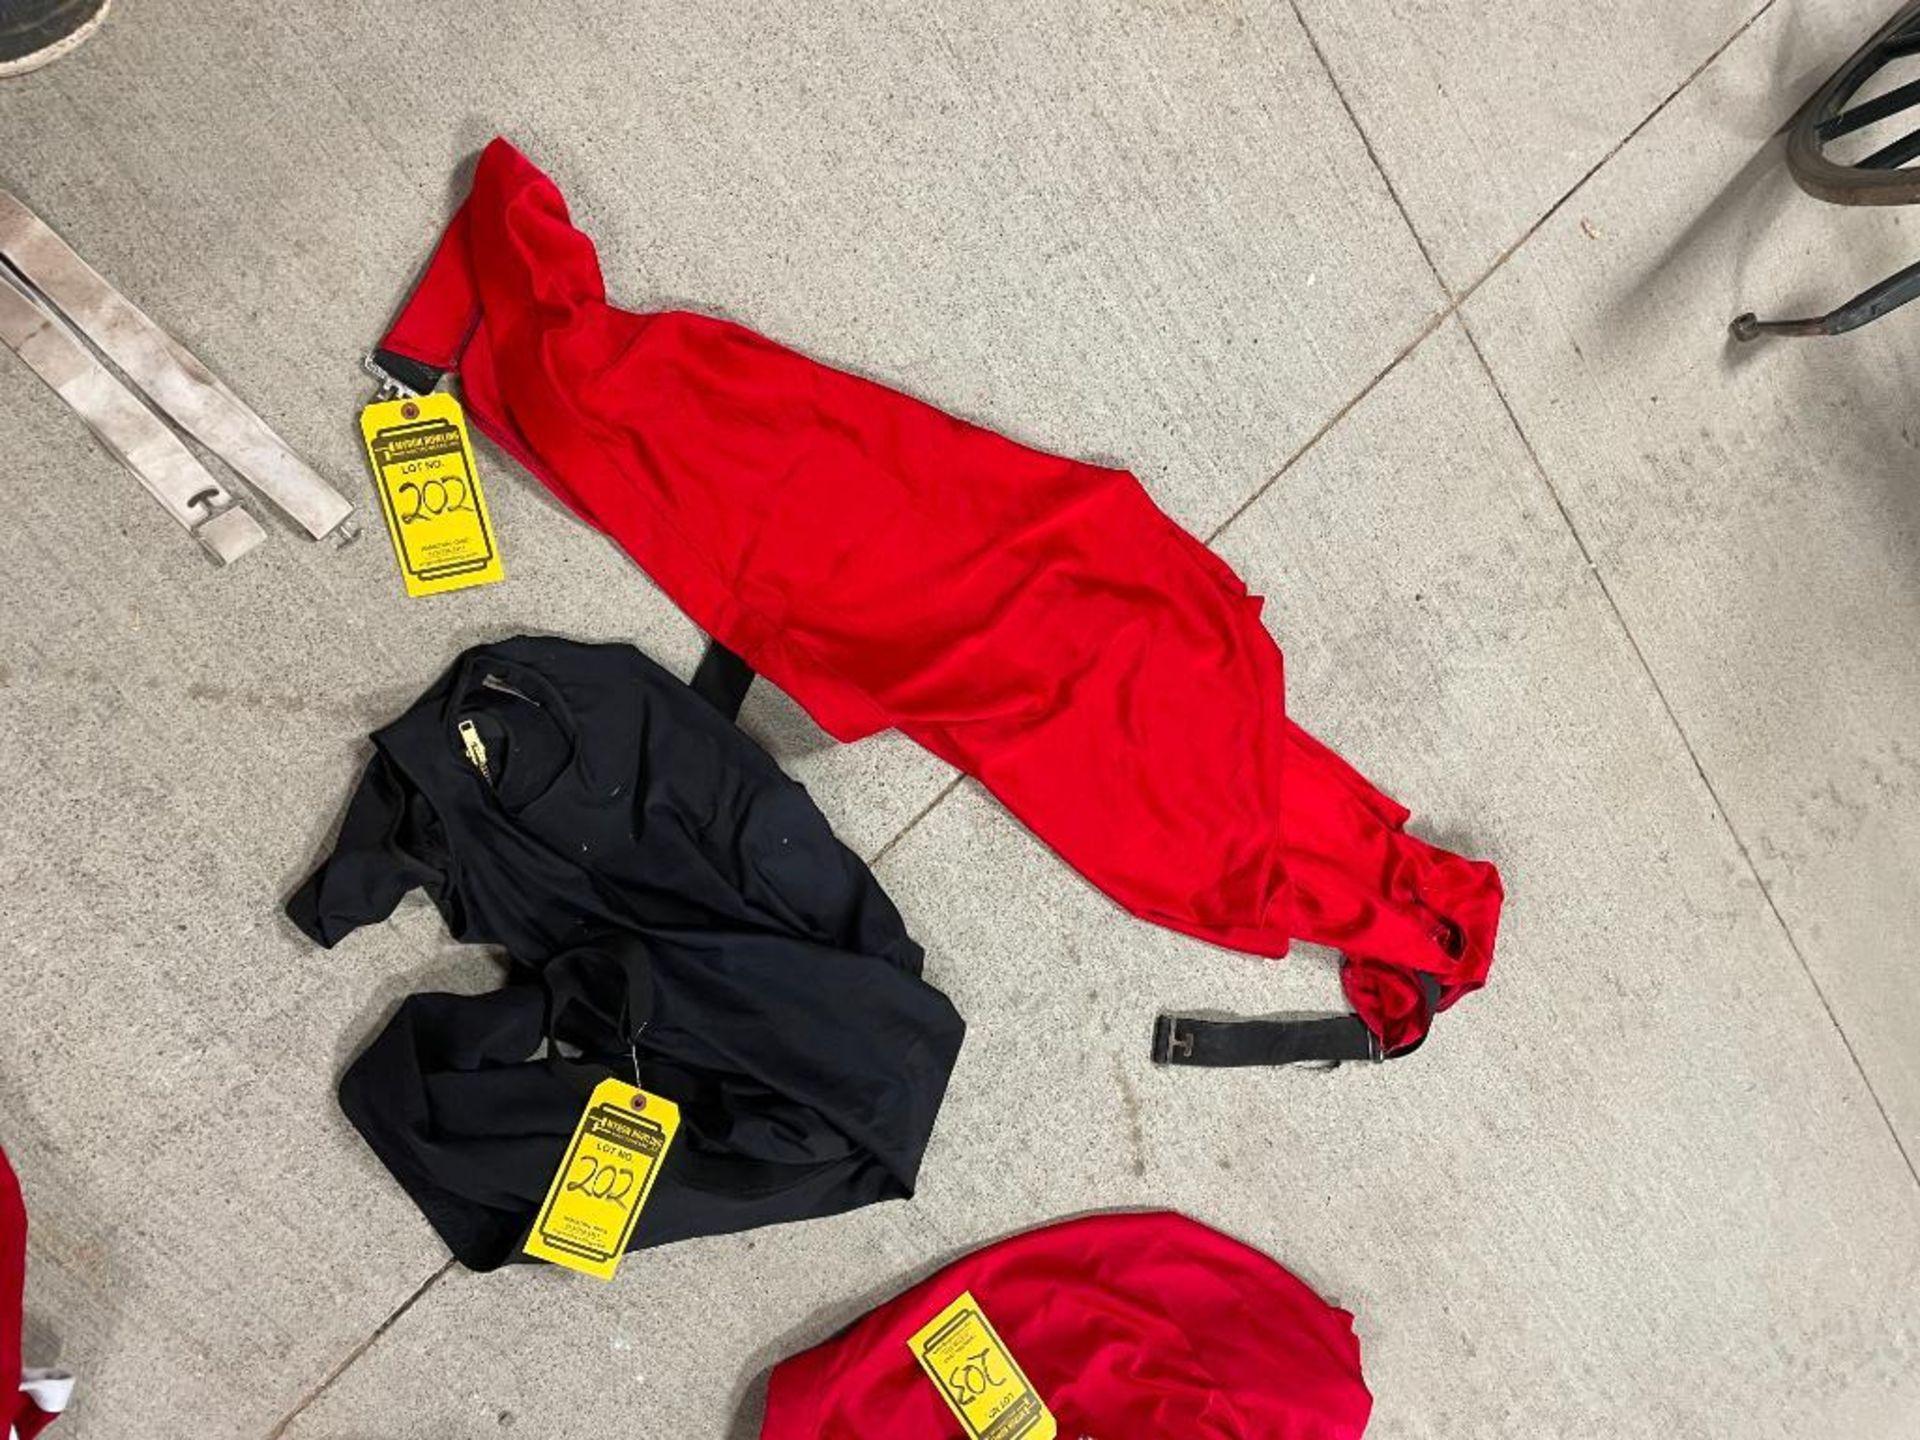 (2) Neck Sleazys: (1) Red, (1) Black